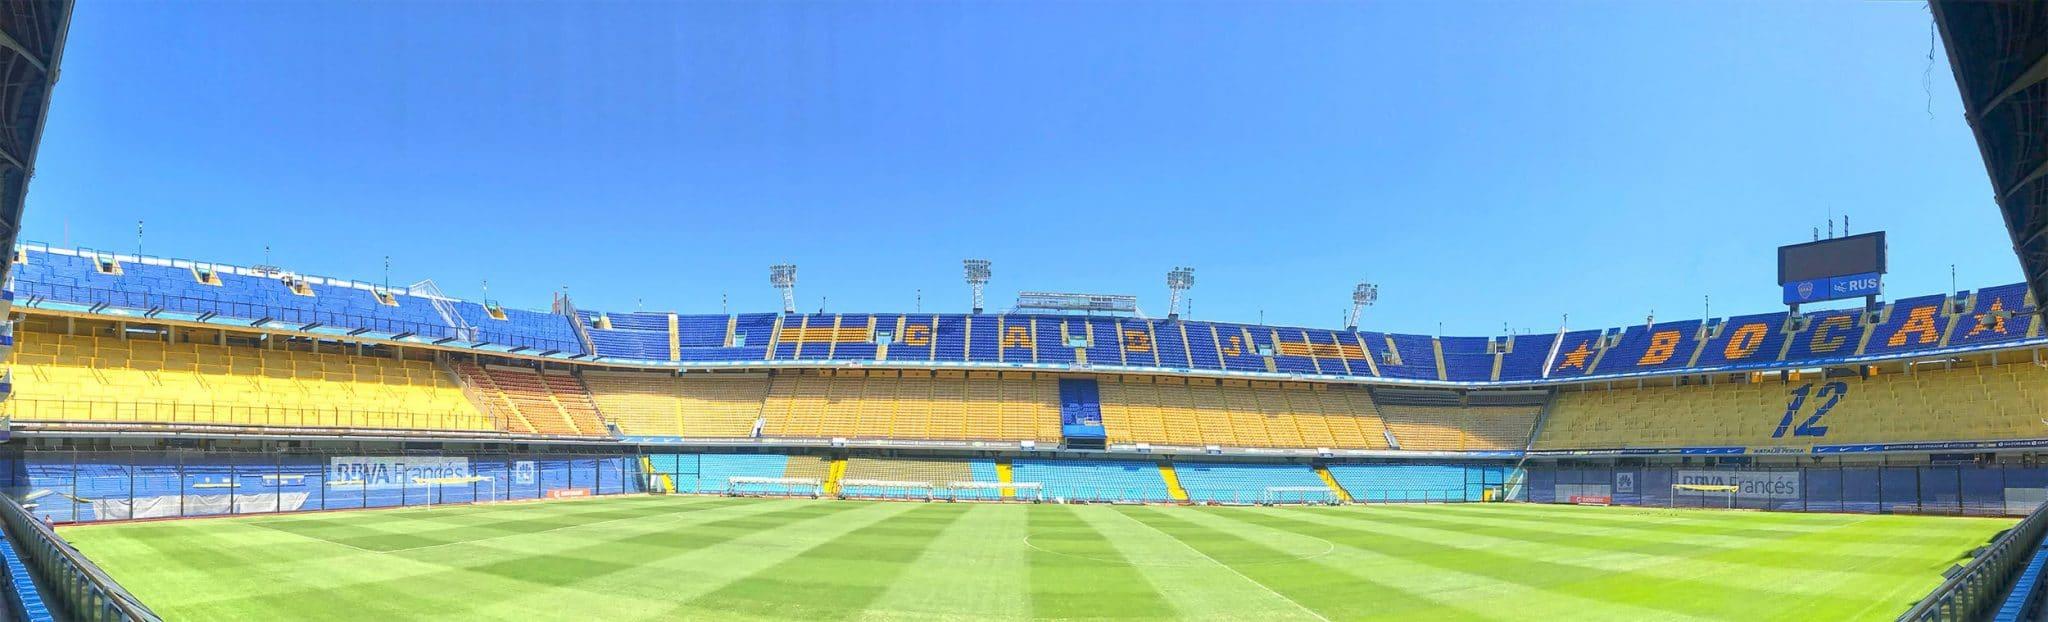 La Bombonera visit tour stadium